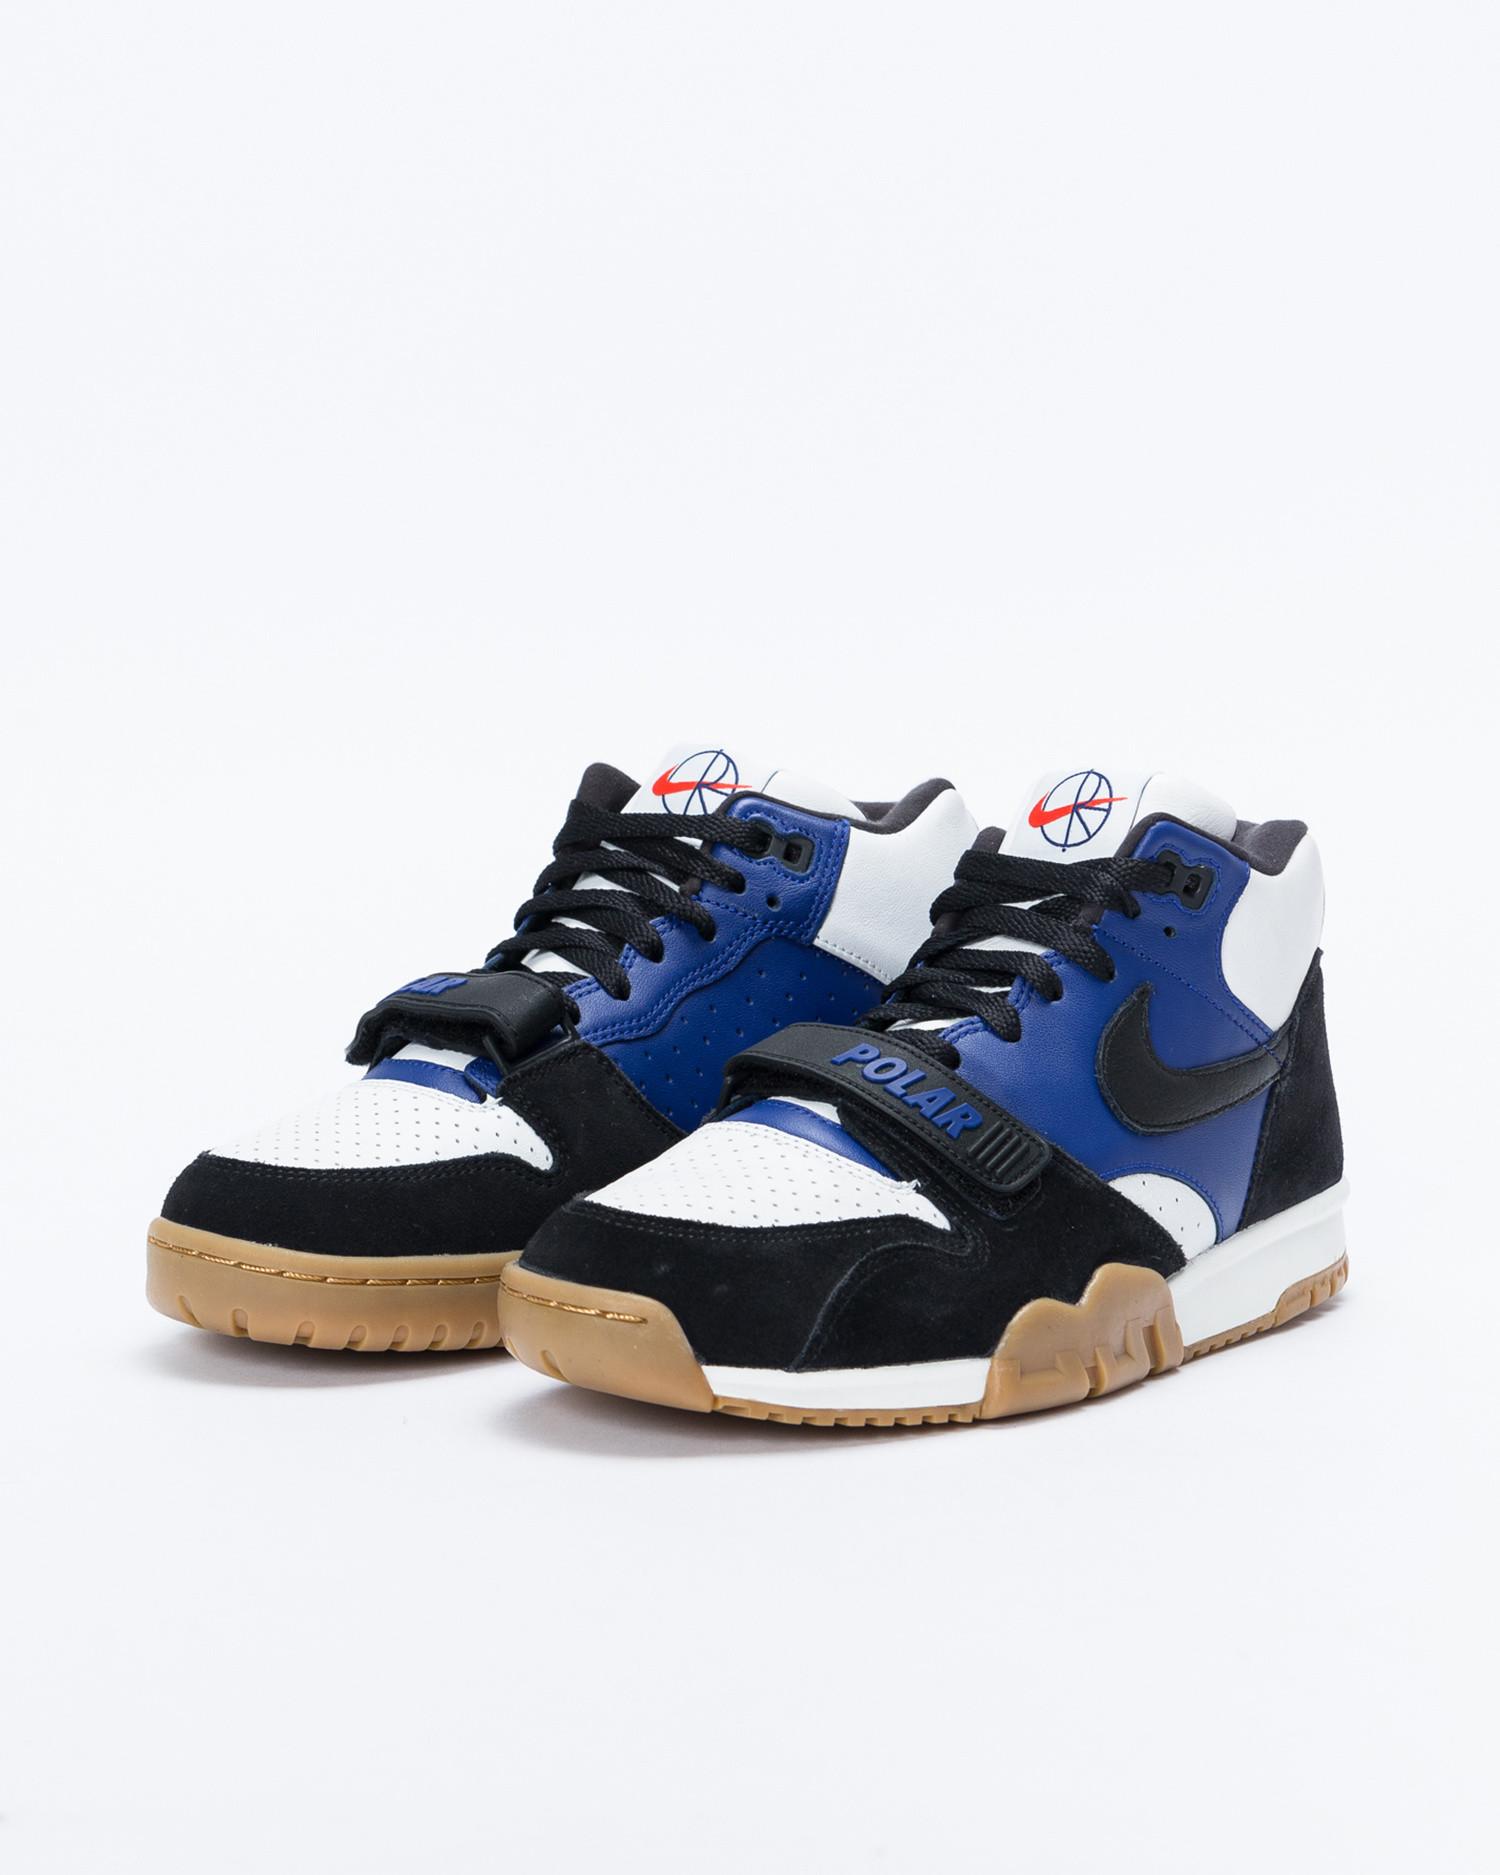 Nike SB x POLAR  Air Trainer I QS Black/Black-Deep Royal Blue-Summit White